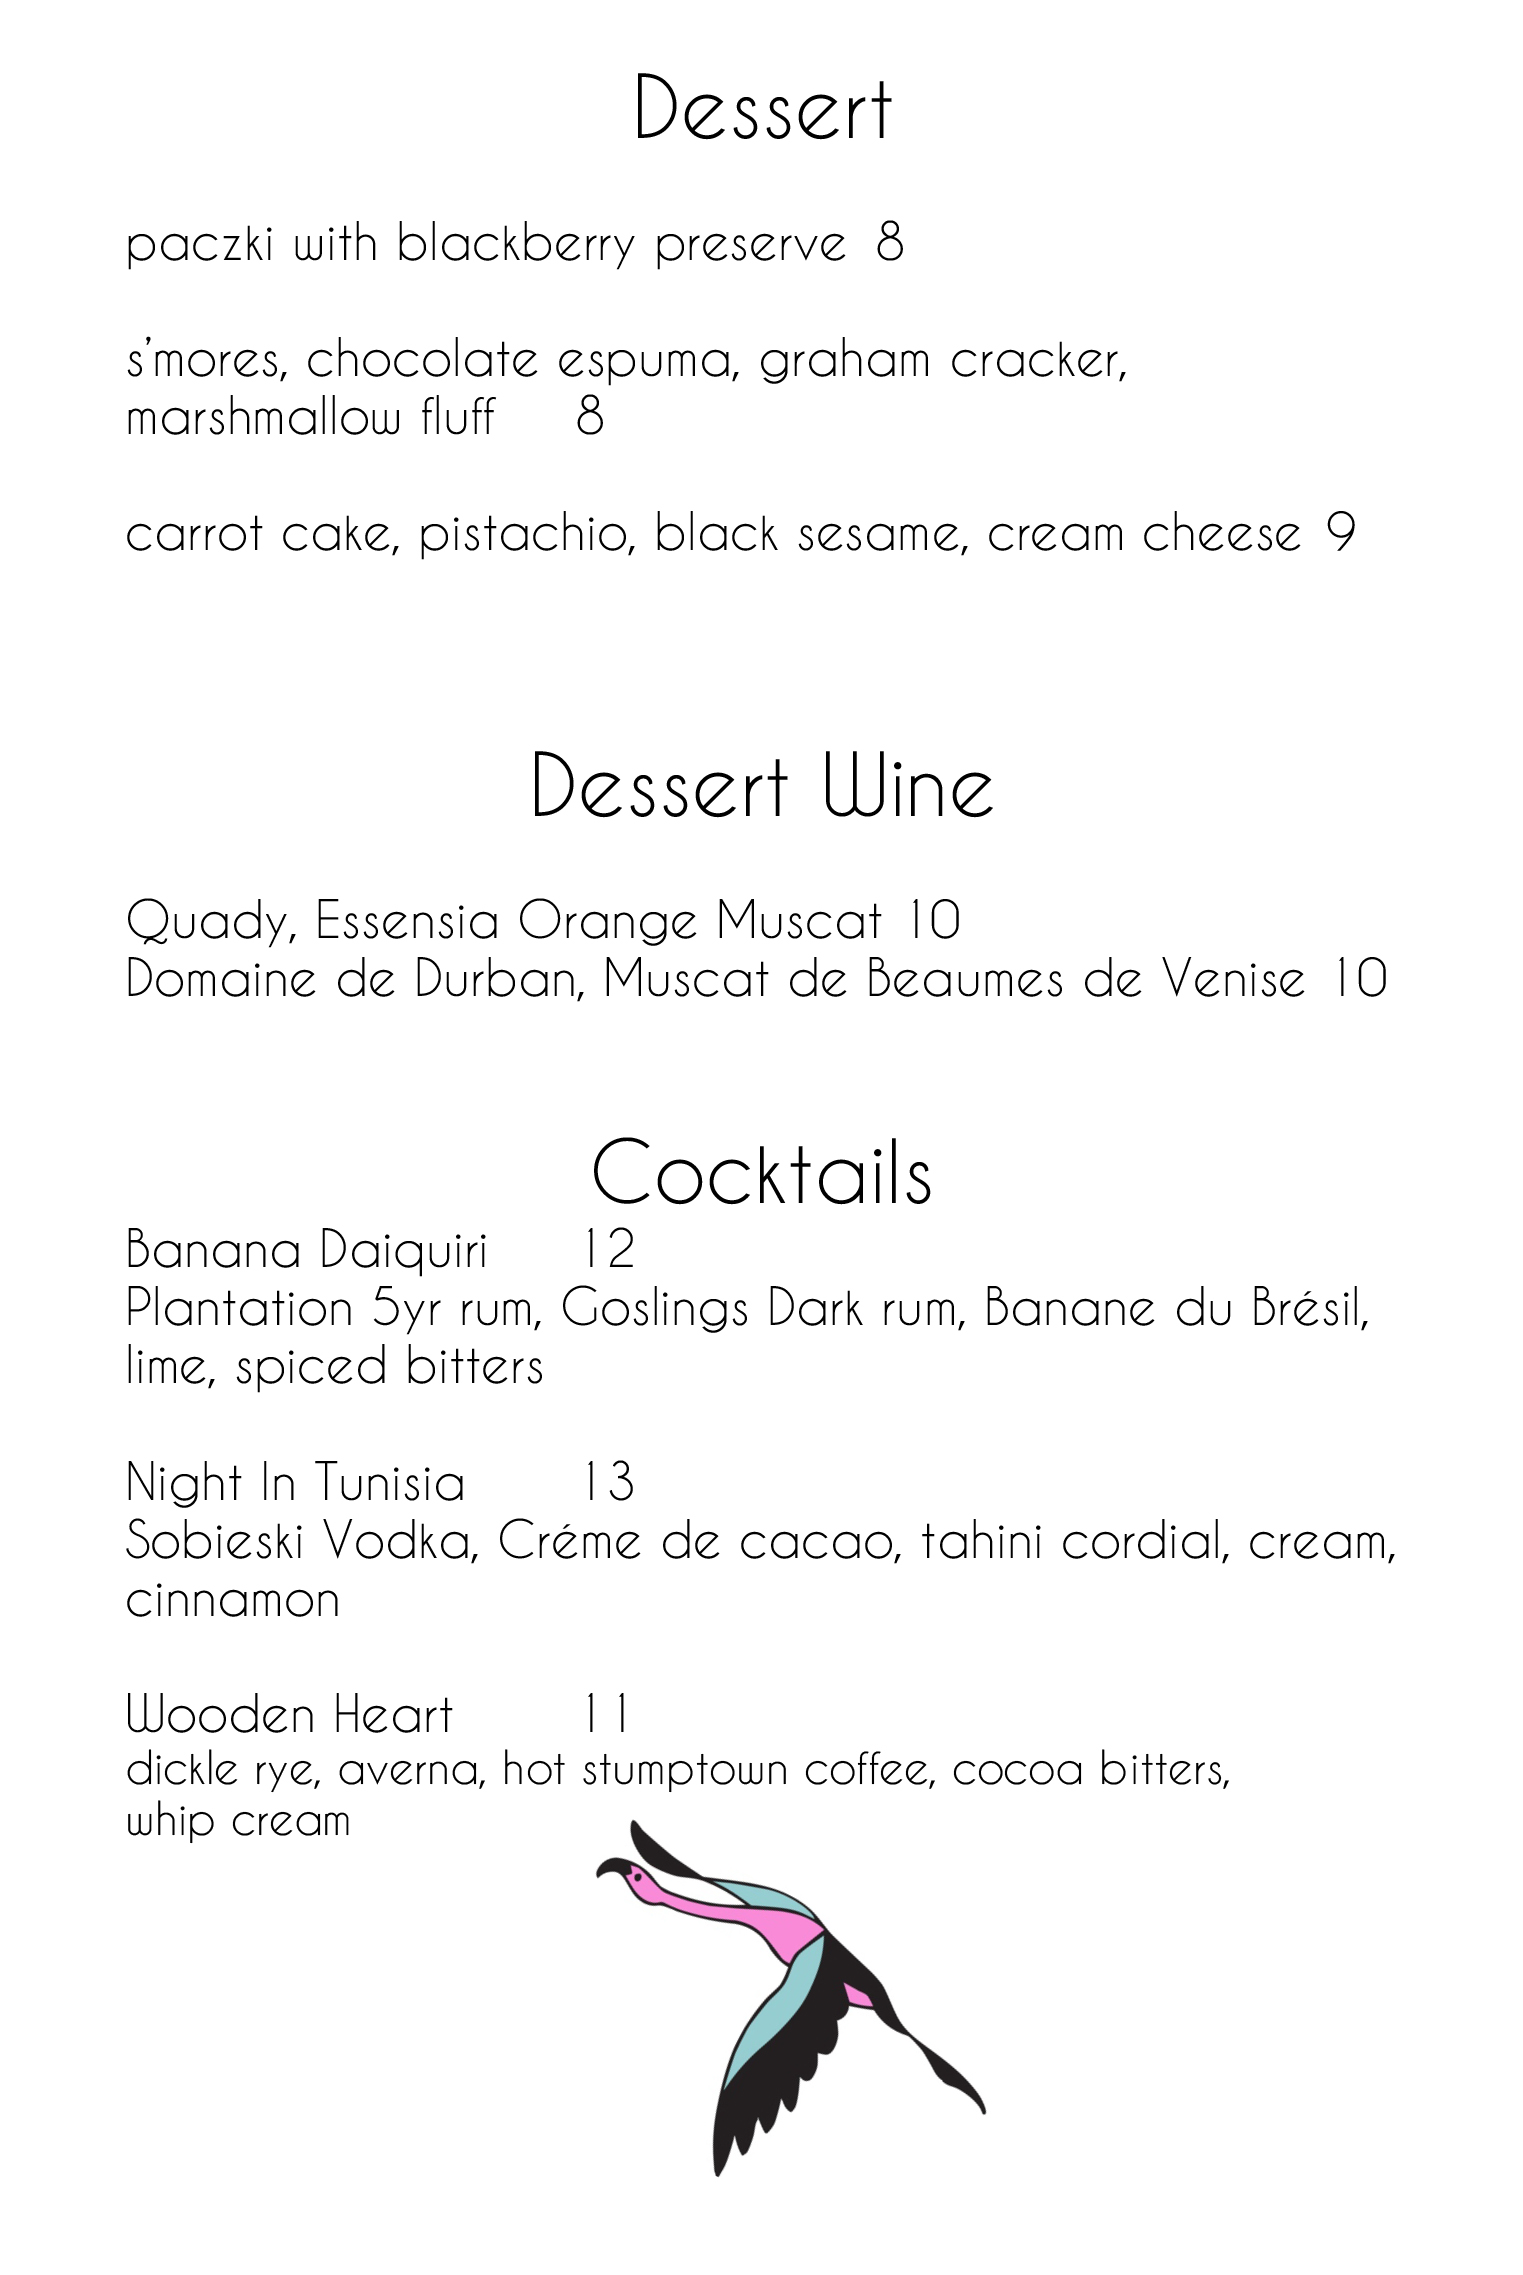 Dessert Menu 4.5.19.jpg